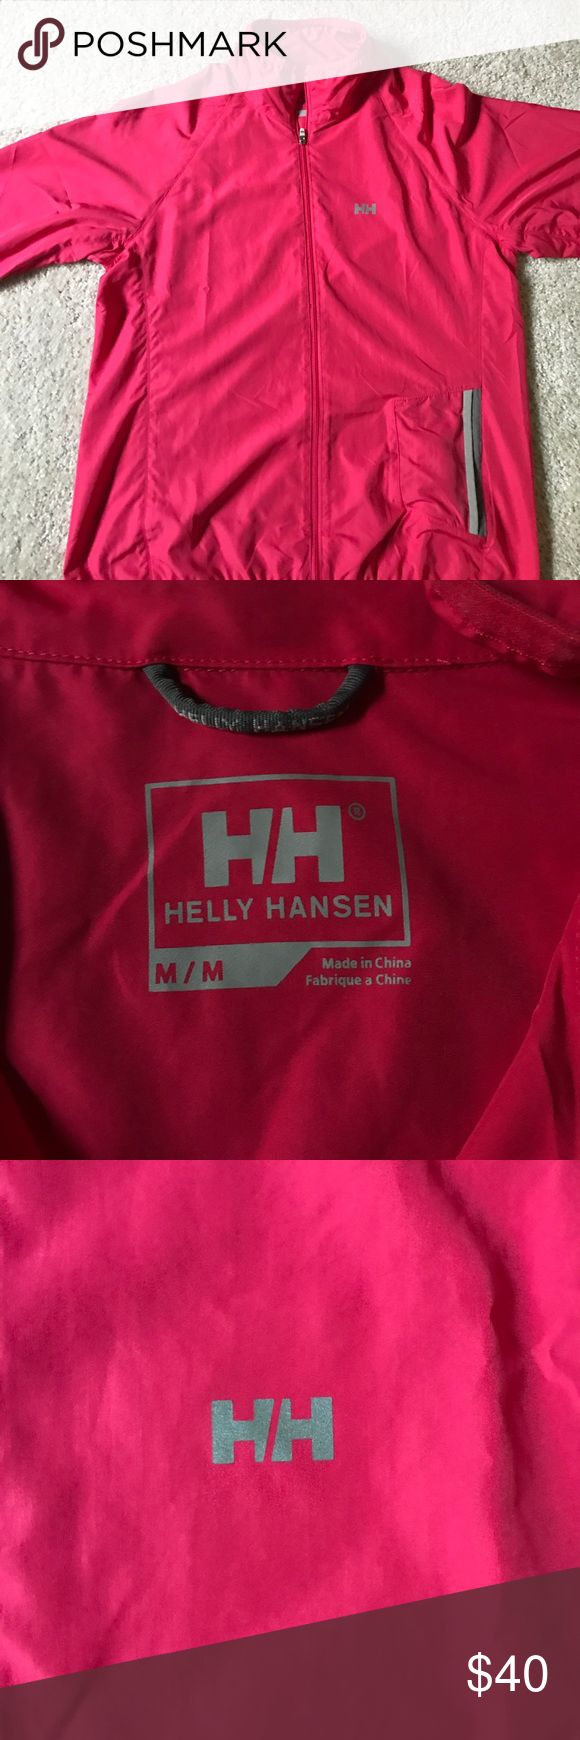 Helly Hansen light jacket Lightweight Helly Hansen jacket. Only worn a few times in excellent condition Helly Hansen Jackets & Coats